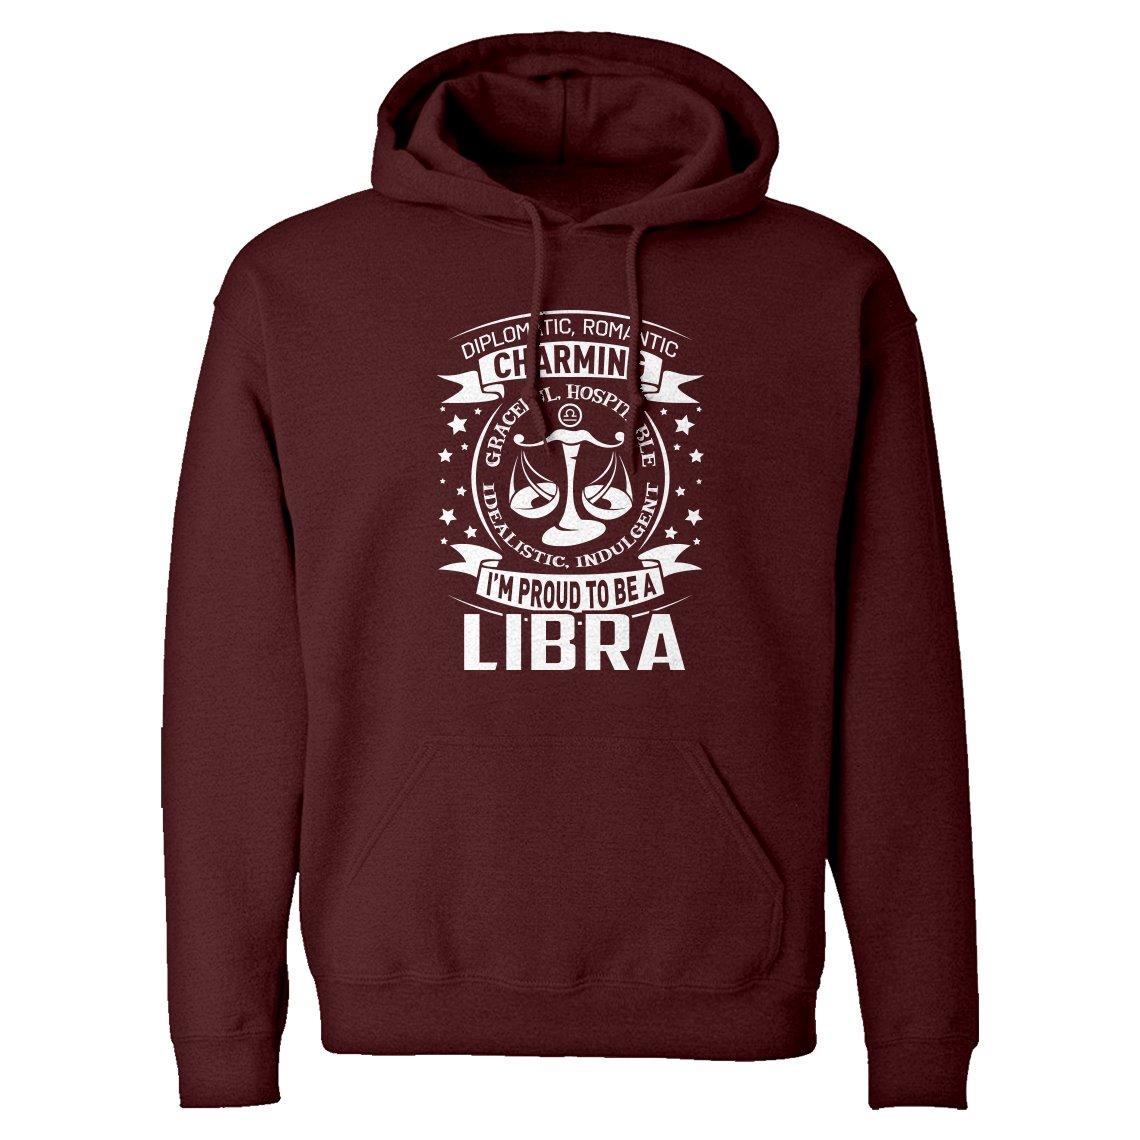 Libra Astrology Zodiac Sign Unisex Adult Hoodie